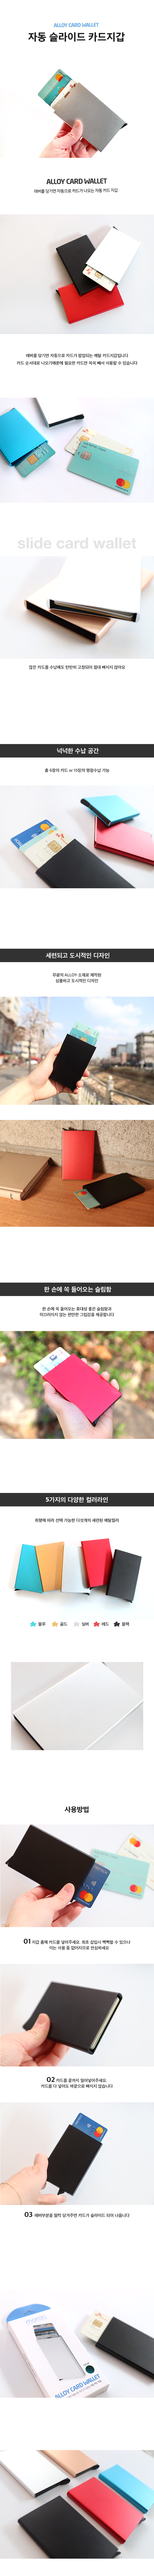 morac 남자 여자 슬림 슬라이드 카드 명함 지갑 - 갓샵, 4,900원, 동전/카드지갑, 카드지갑